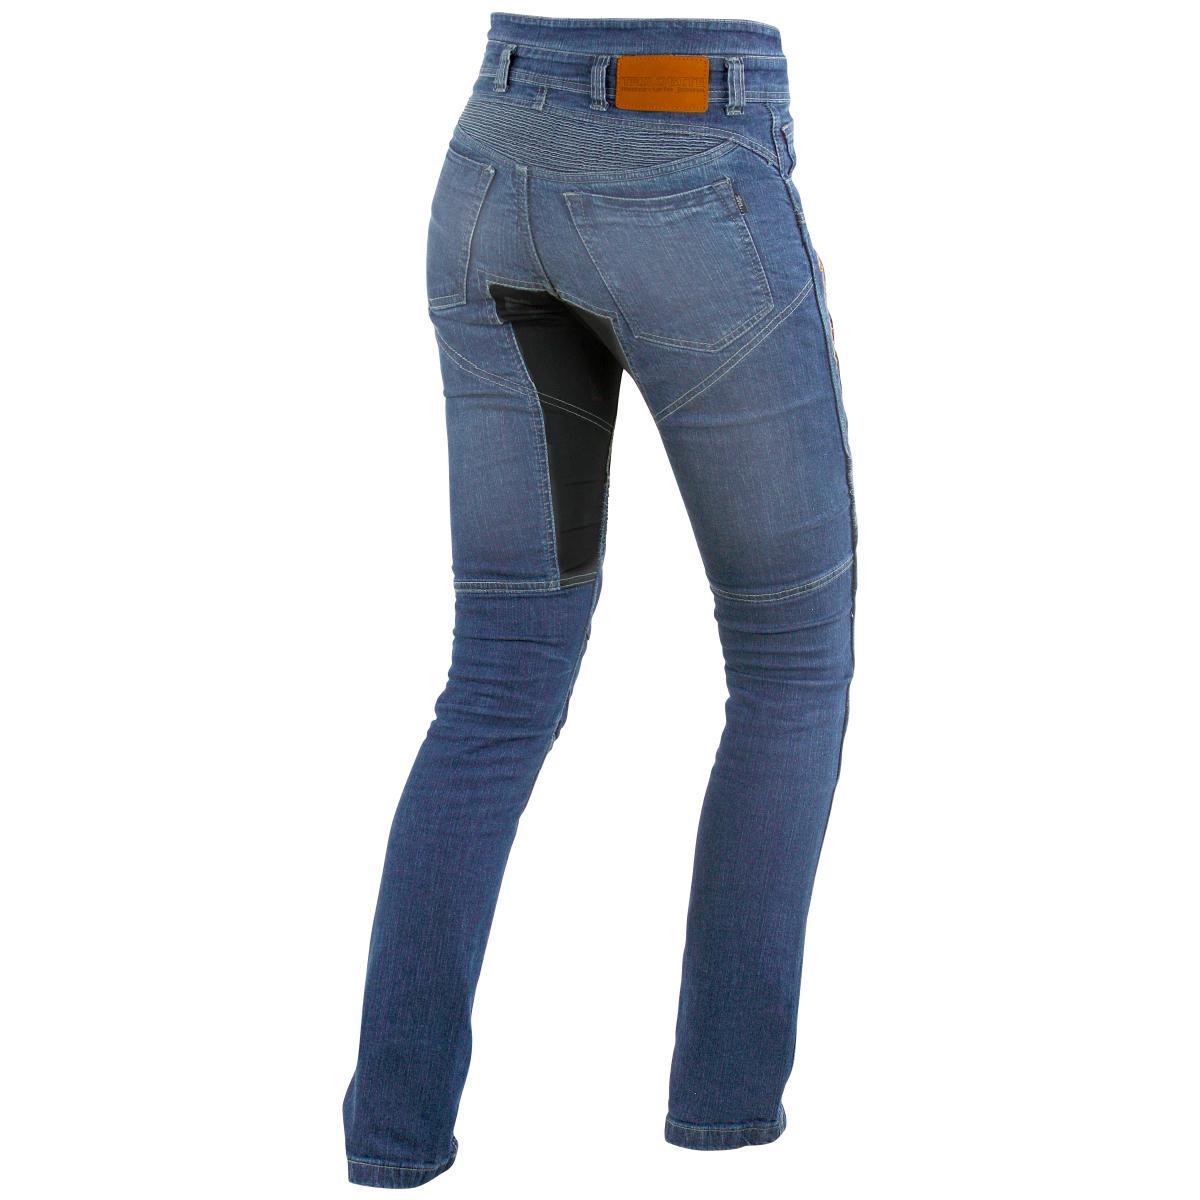 germot trilobite kevlar jeans parado damen jeans hosen. Black Bedroom Furniture Sets. Home Design Ideas